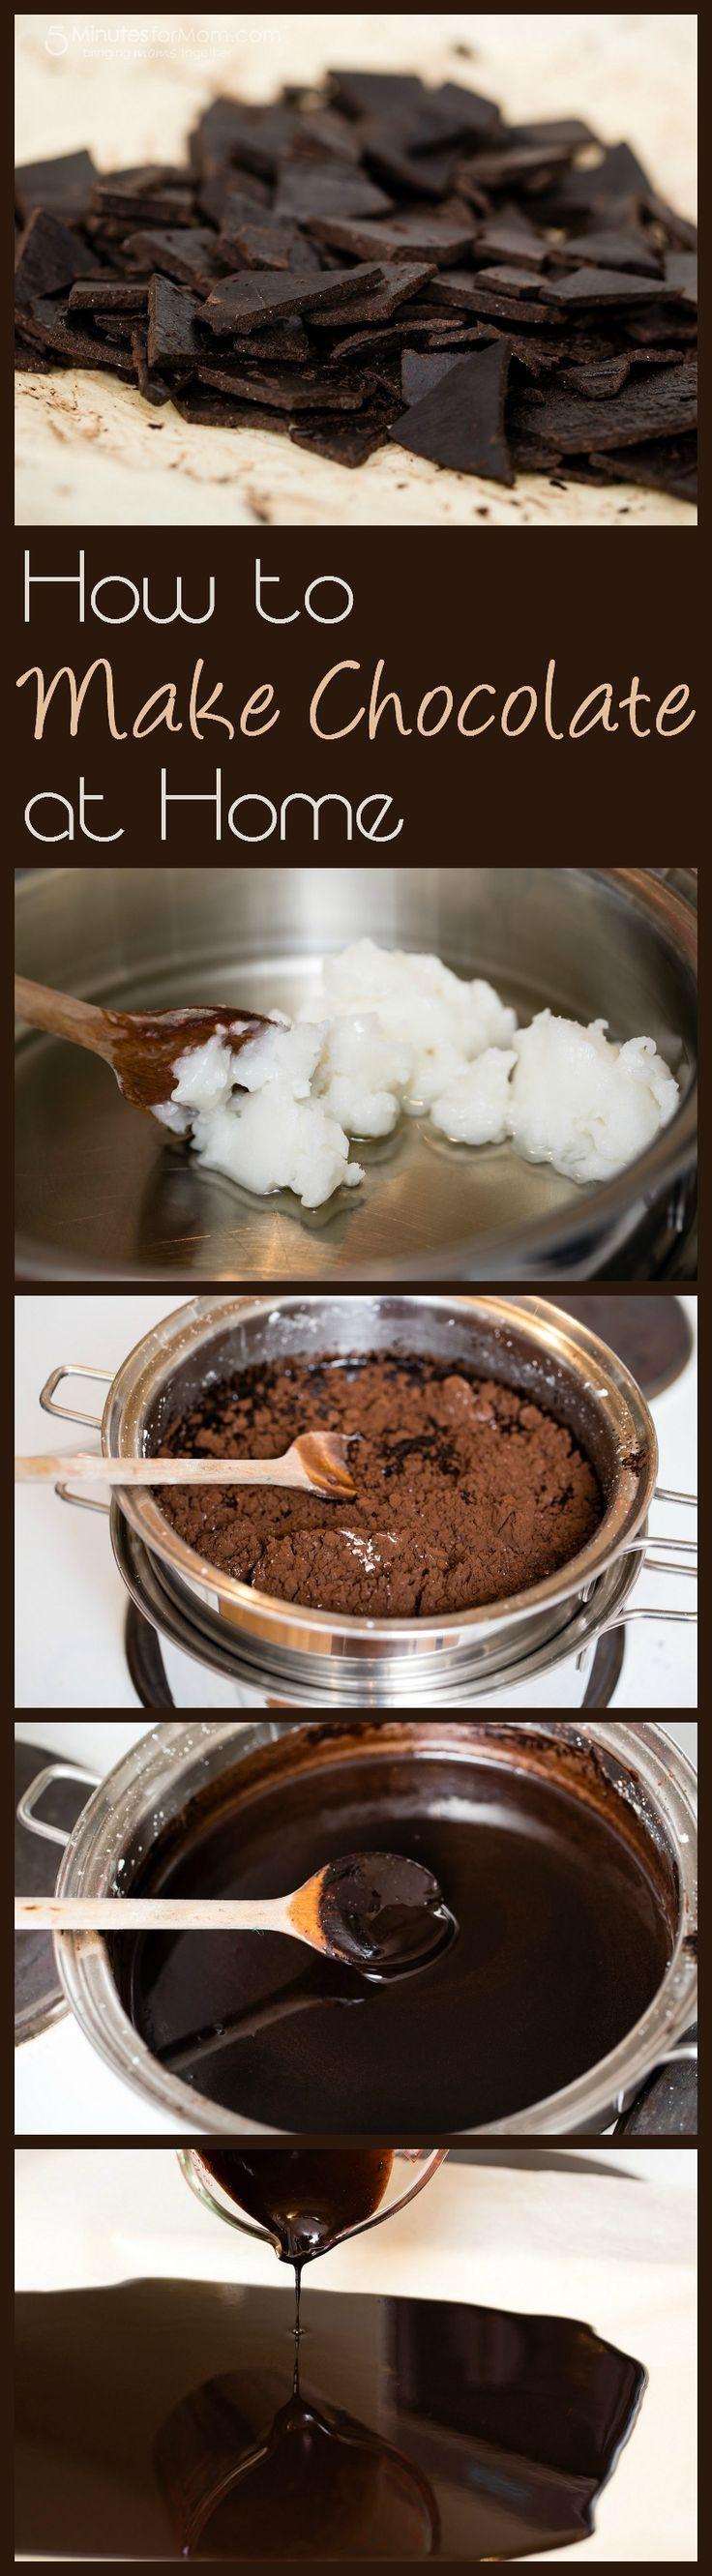 Coconut oil dark chocolate recipe dark chocolate